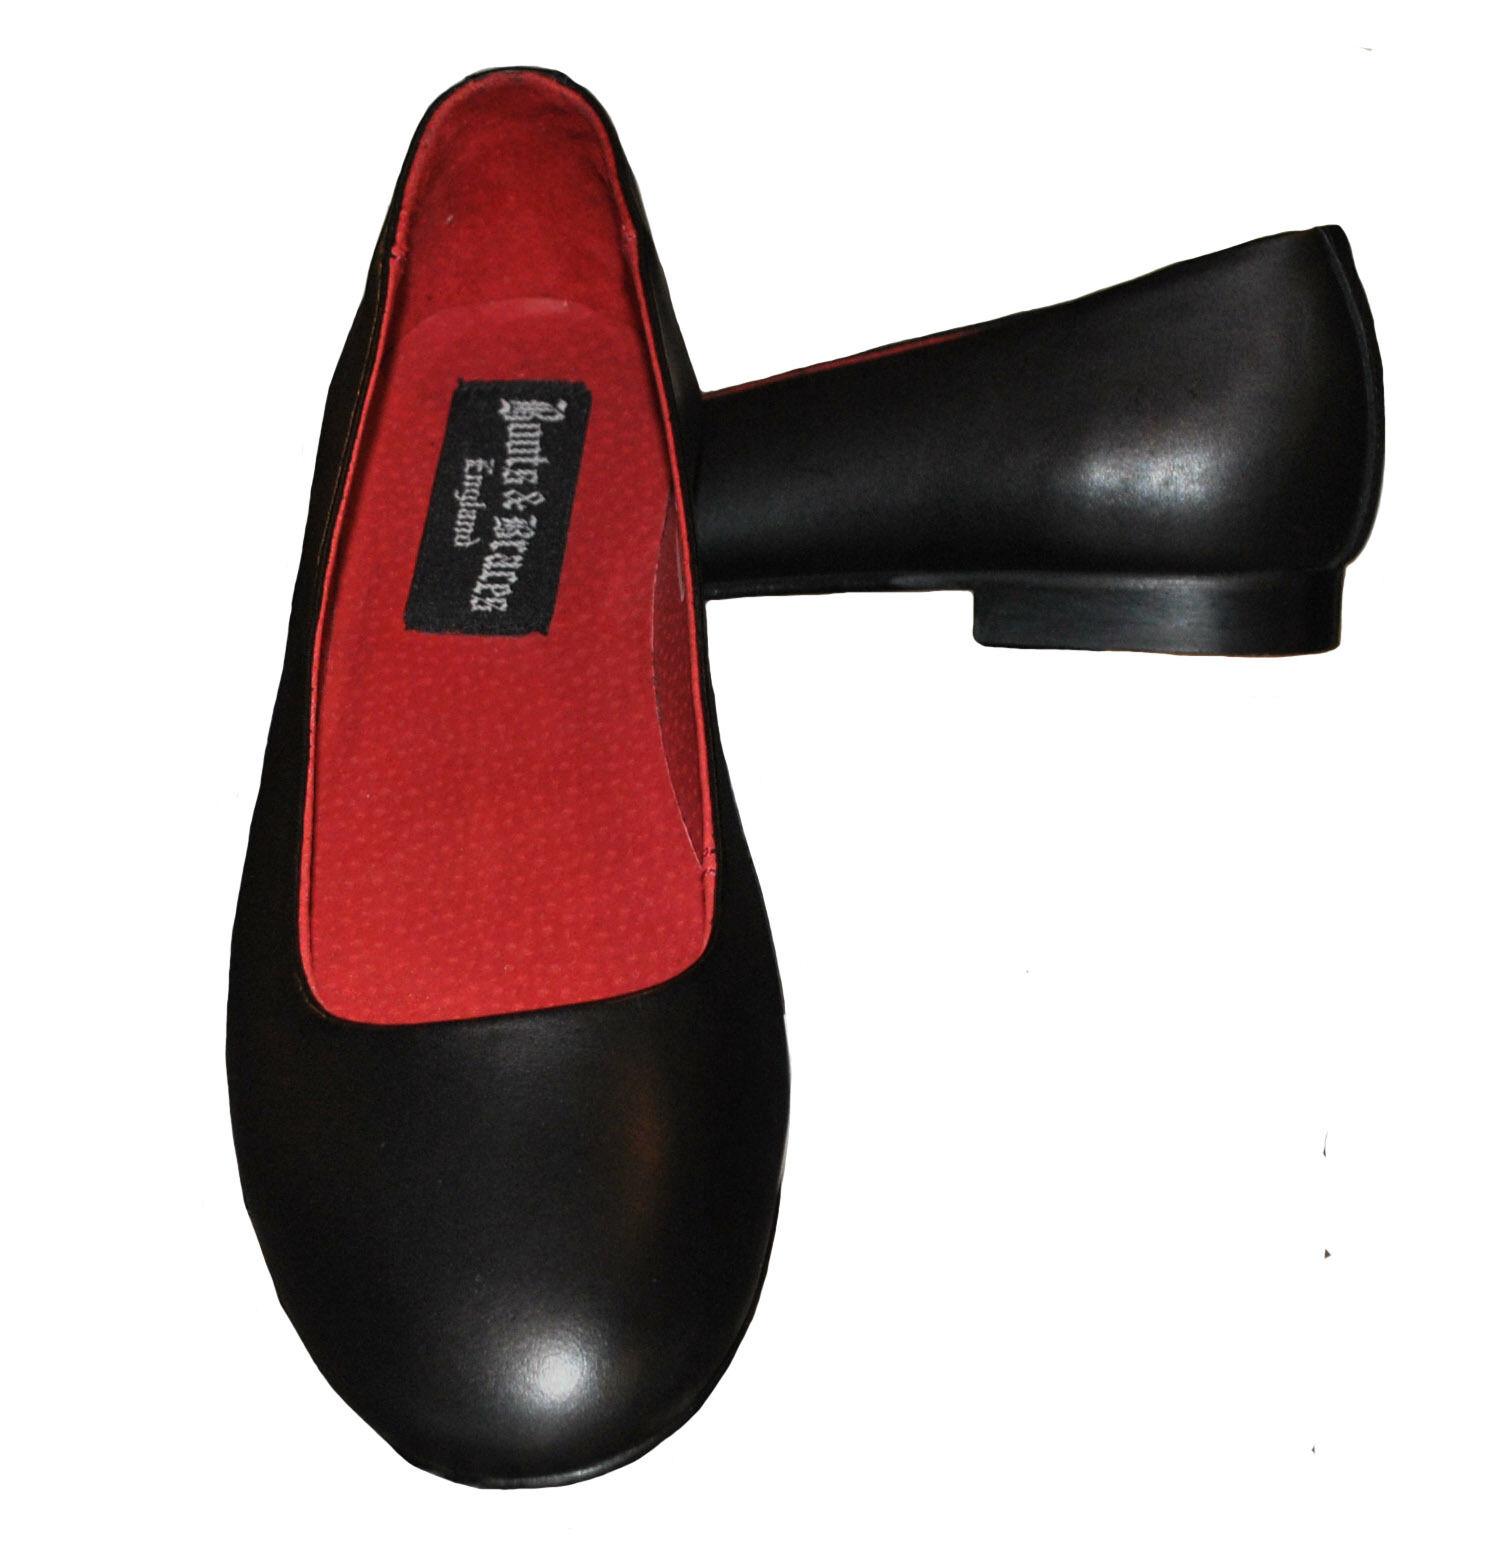 50s style Escarpins véritable cuir rockabella Ballerines Chaussures Noir taille 36 - 42